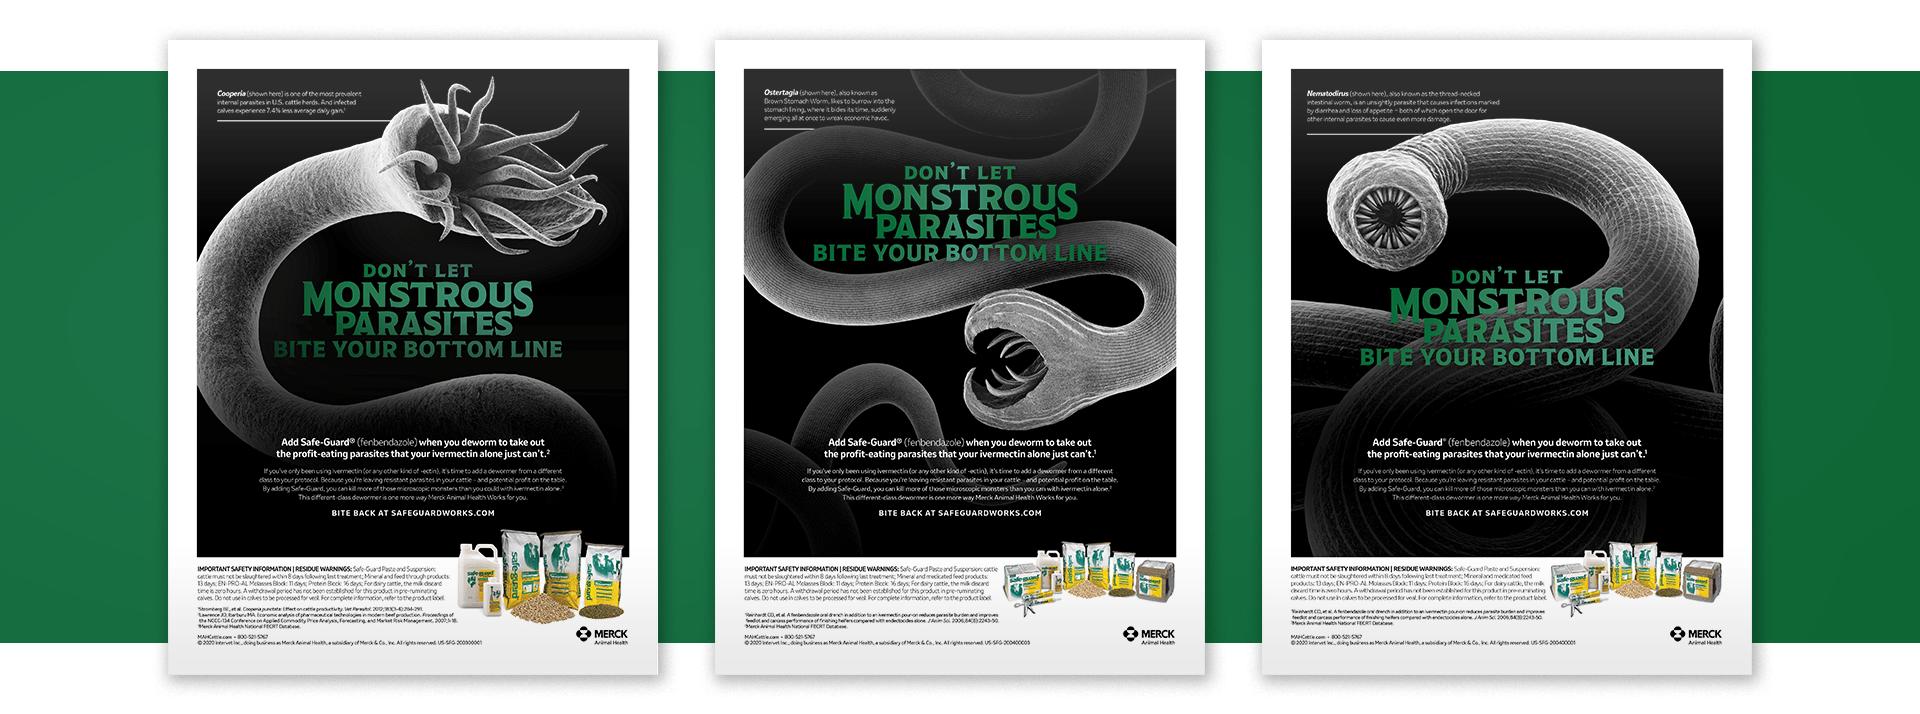 Merck Animal Health Safe-Guard Campaign Print Ads